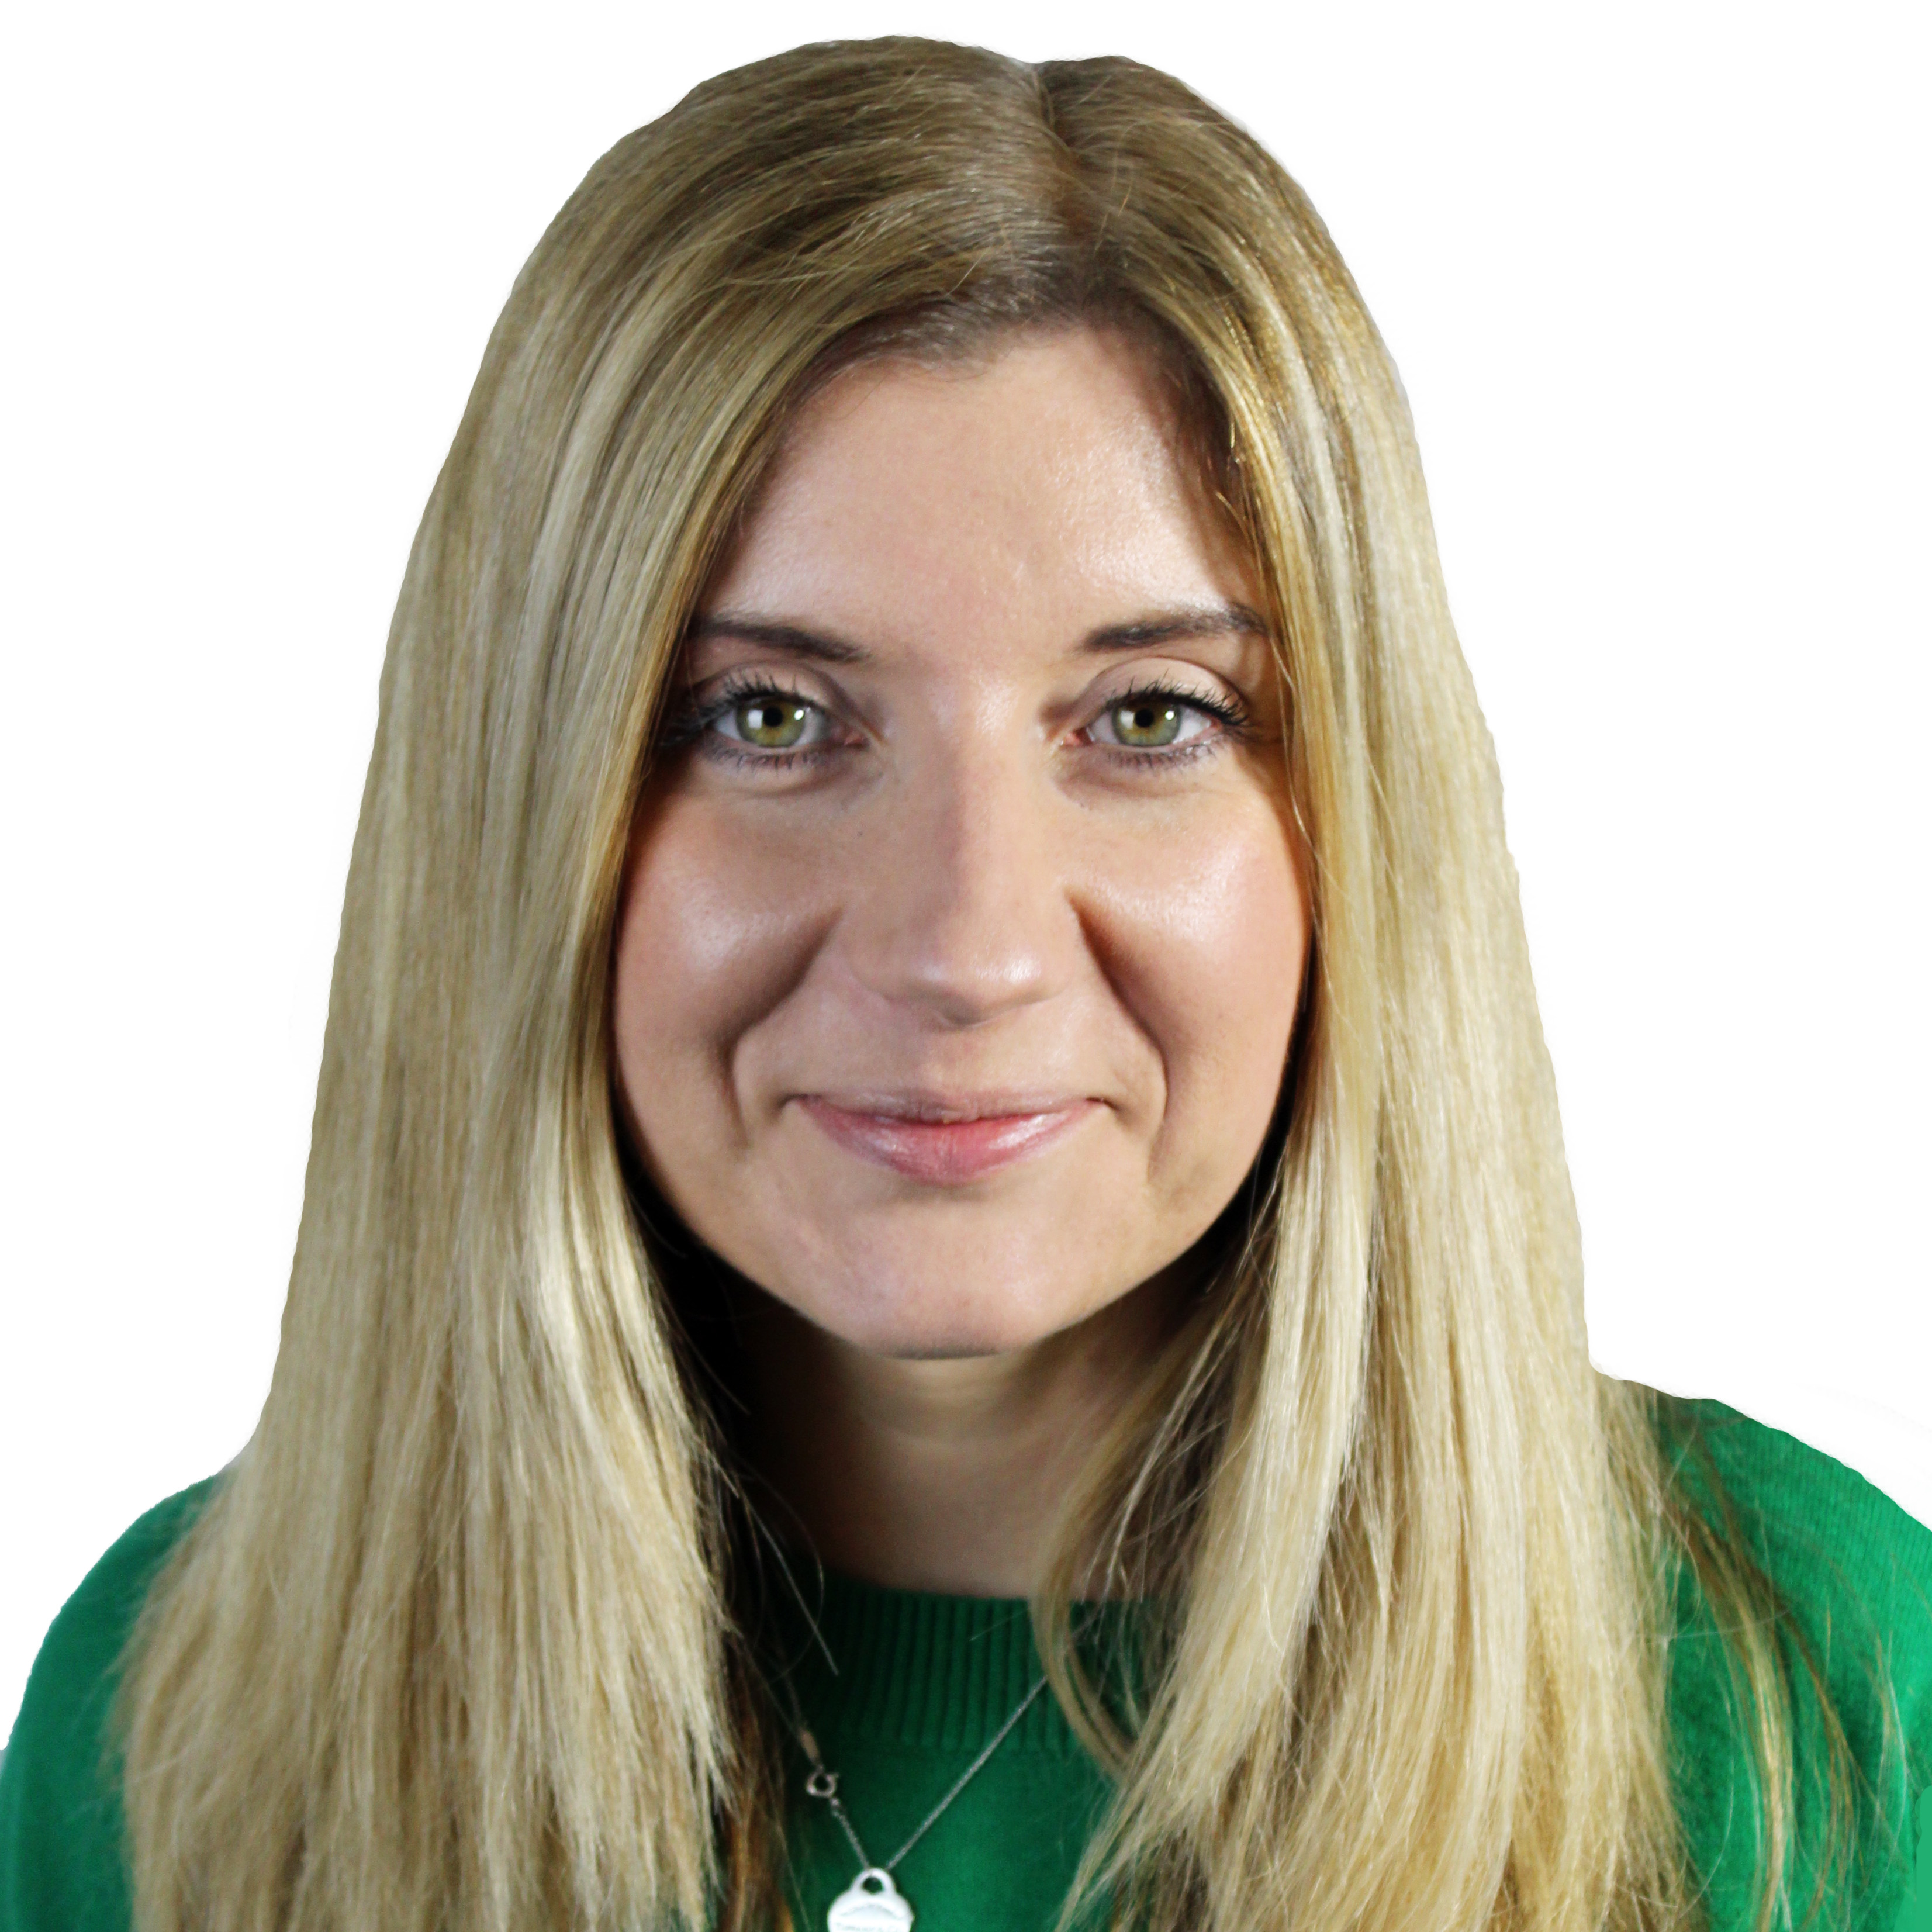 Rachel McGhie : Assistant Headteacher, Studley High School